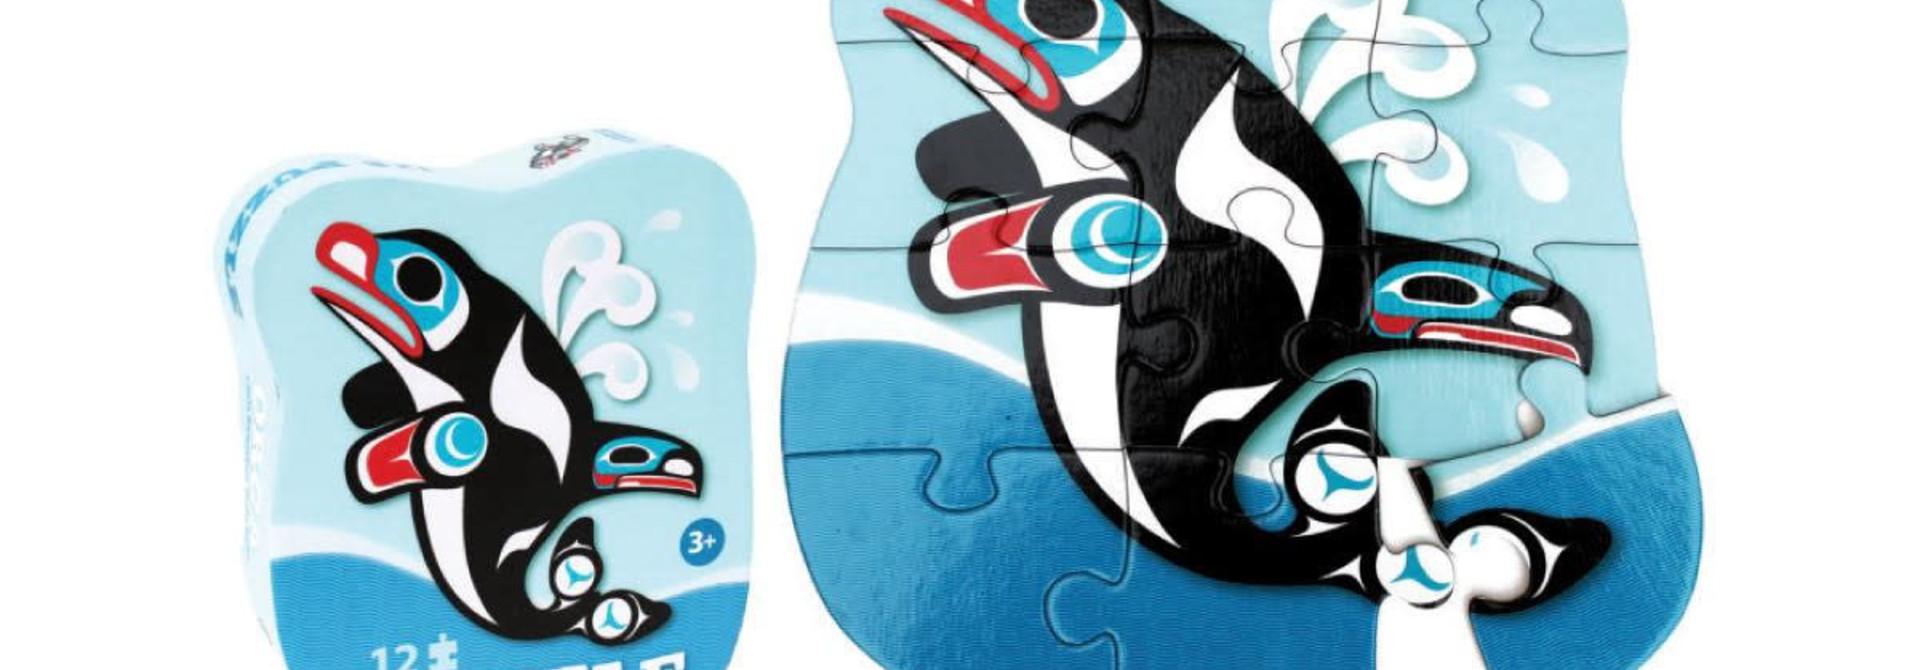 12 Piece Puzzle-Orca by Chris Kewistep